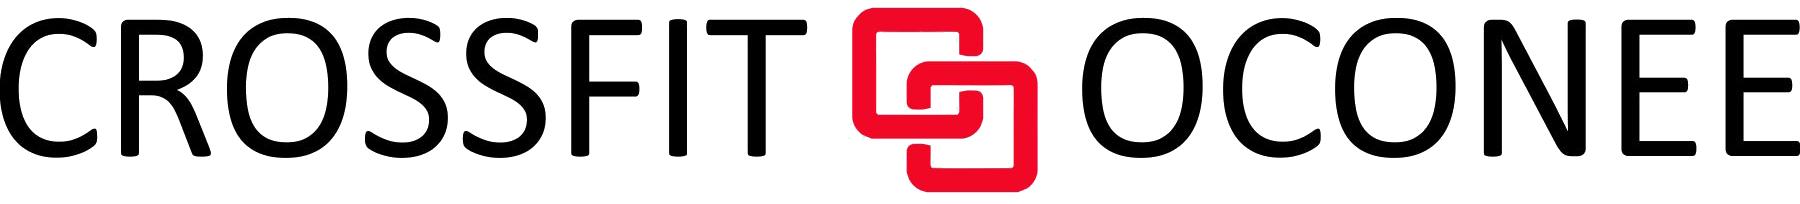 Crossfit Oconee Logo